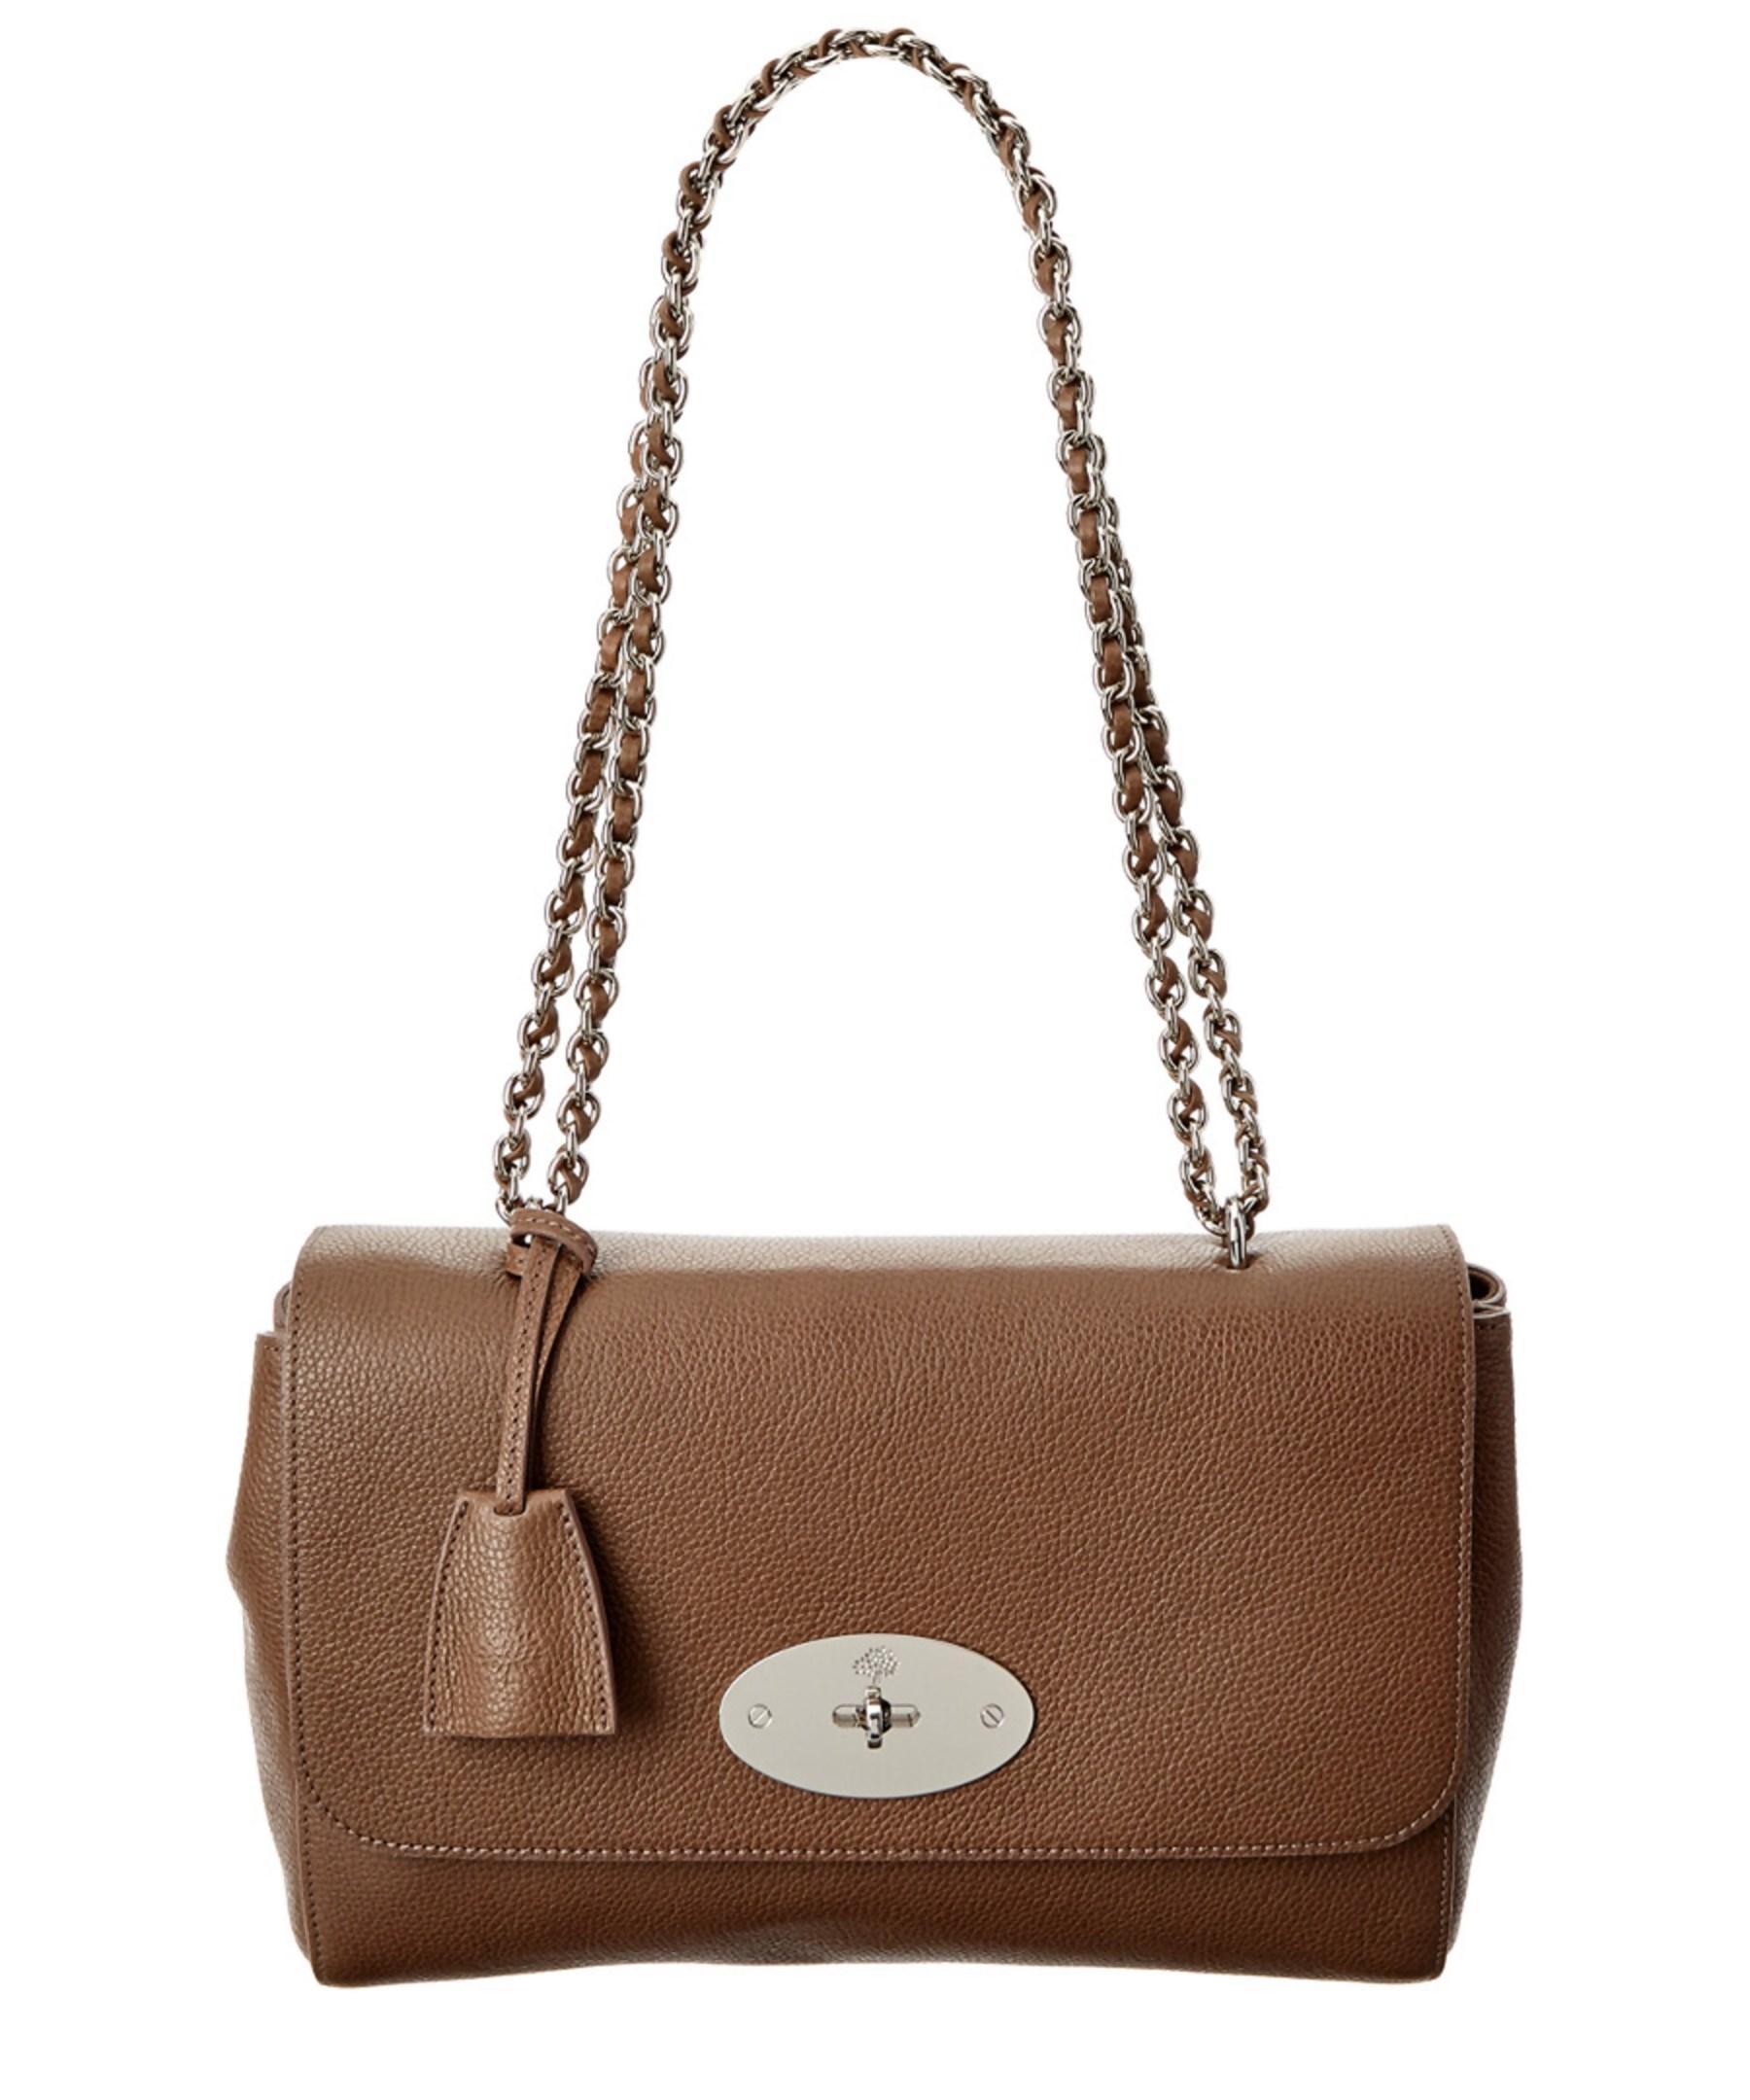 ... sale lyst mulberry medium lily classic grain leather shoulder bag in  brown c65d4 a1e0e c2762dd7bba4f